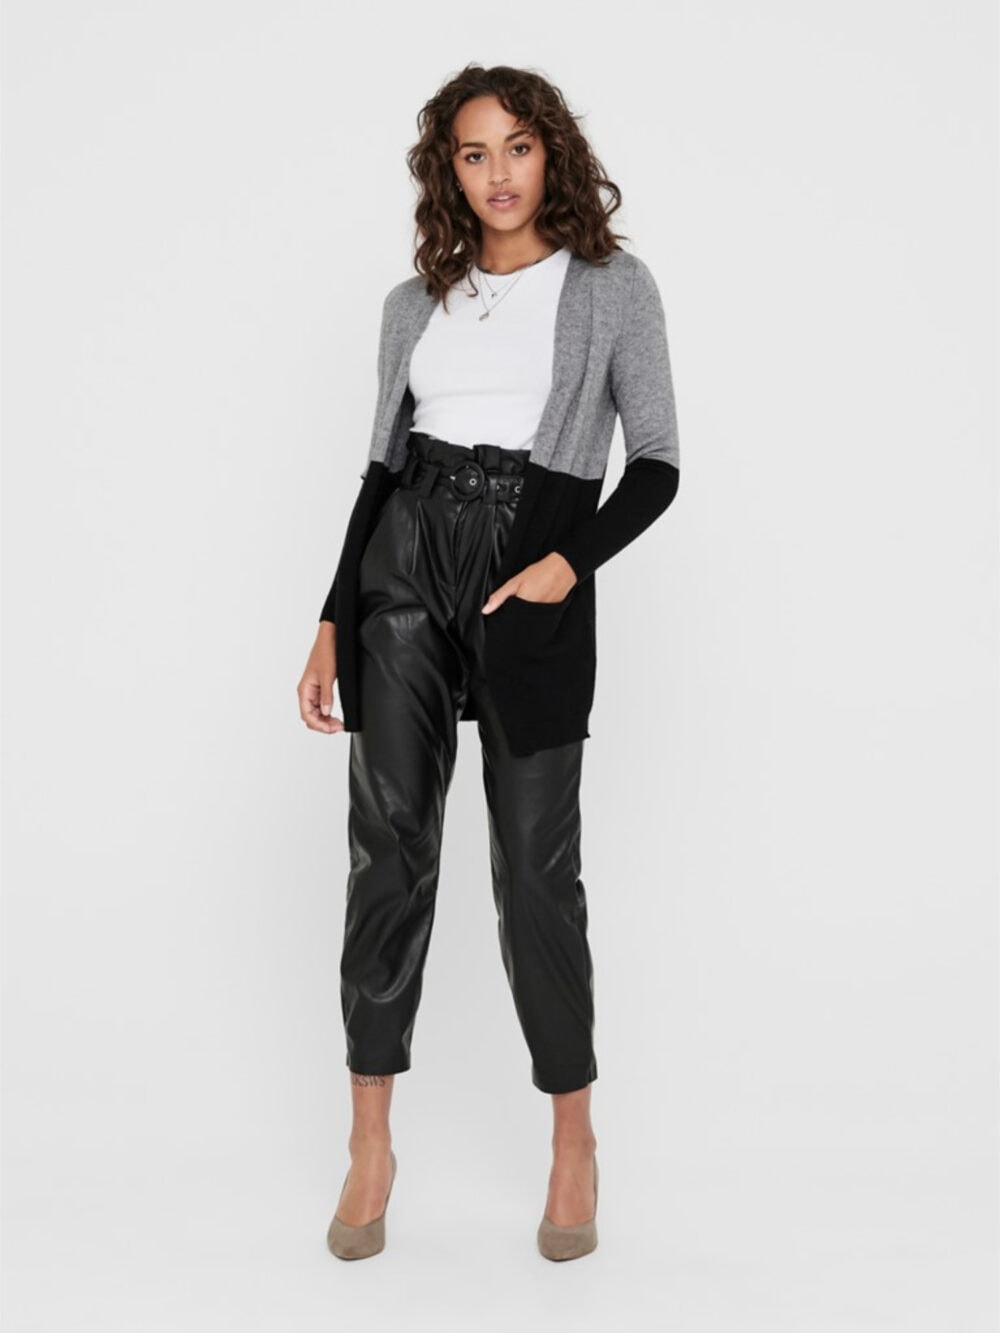 Only Queen Long Cardigan Medium Grey Melange W. BLACK